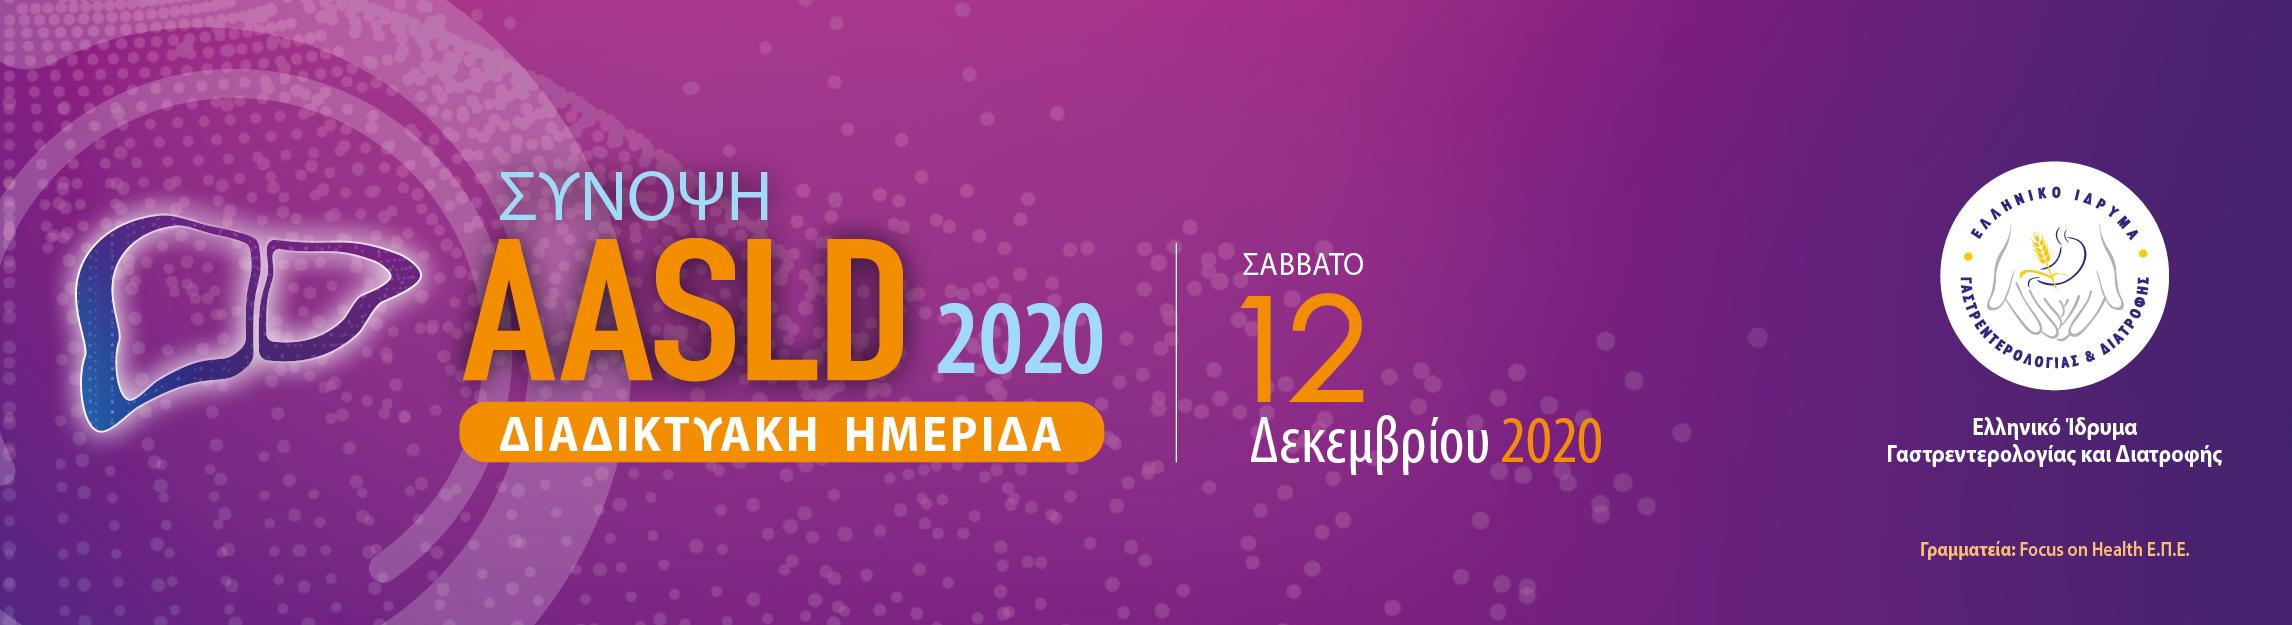 AASLD 2020